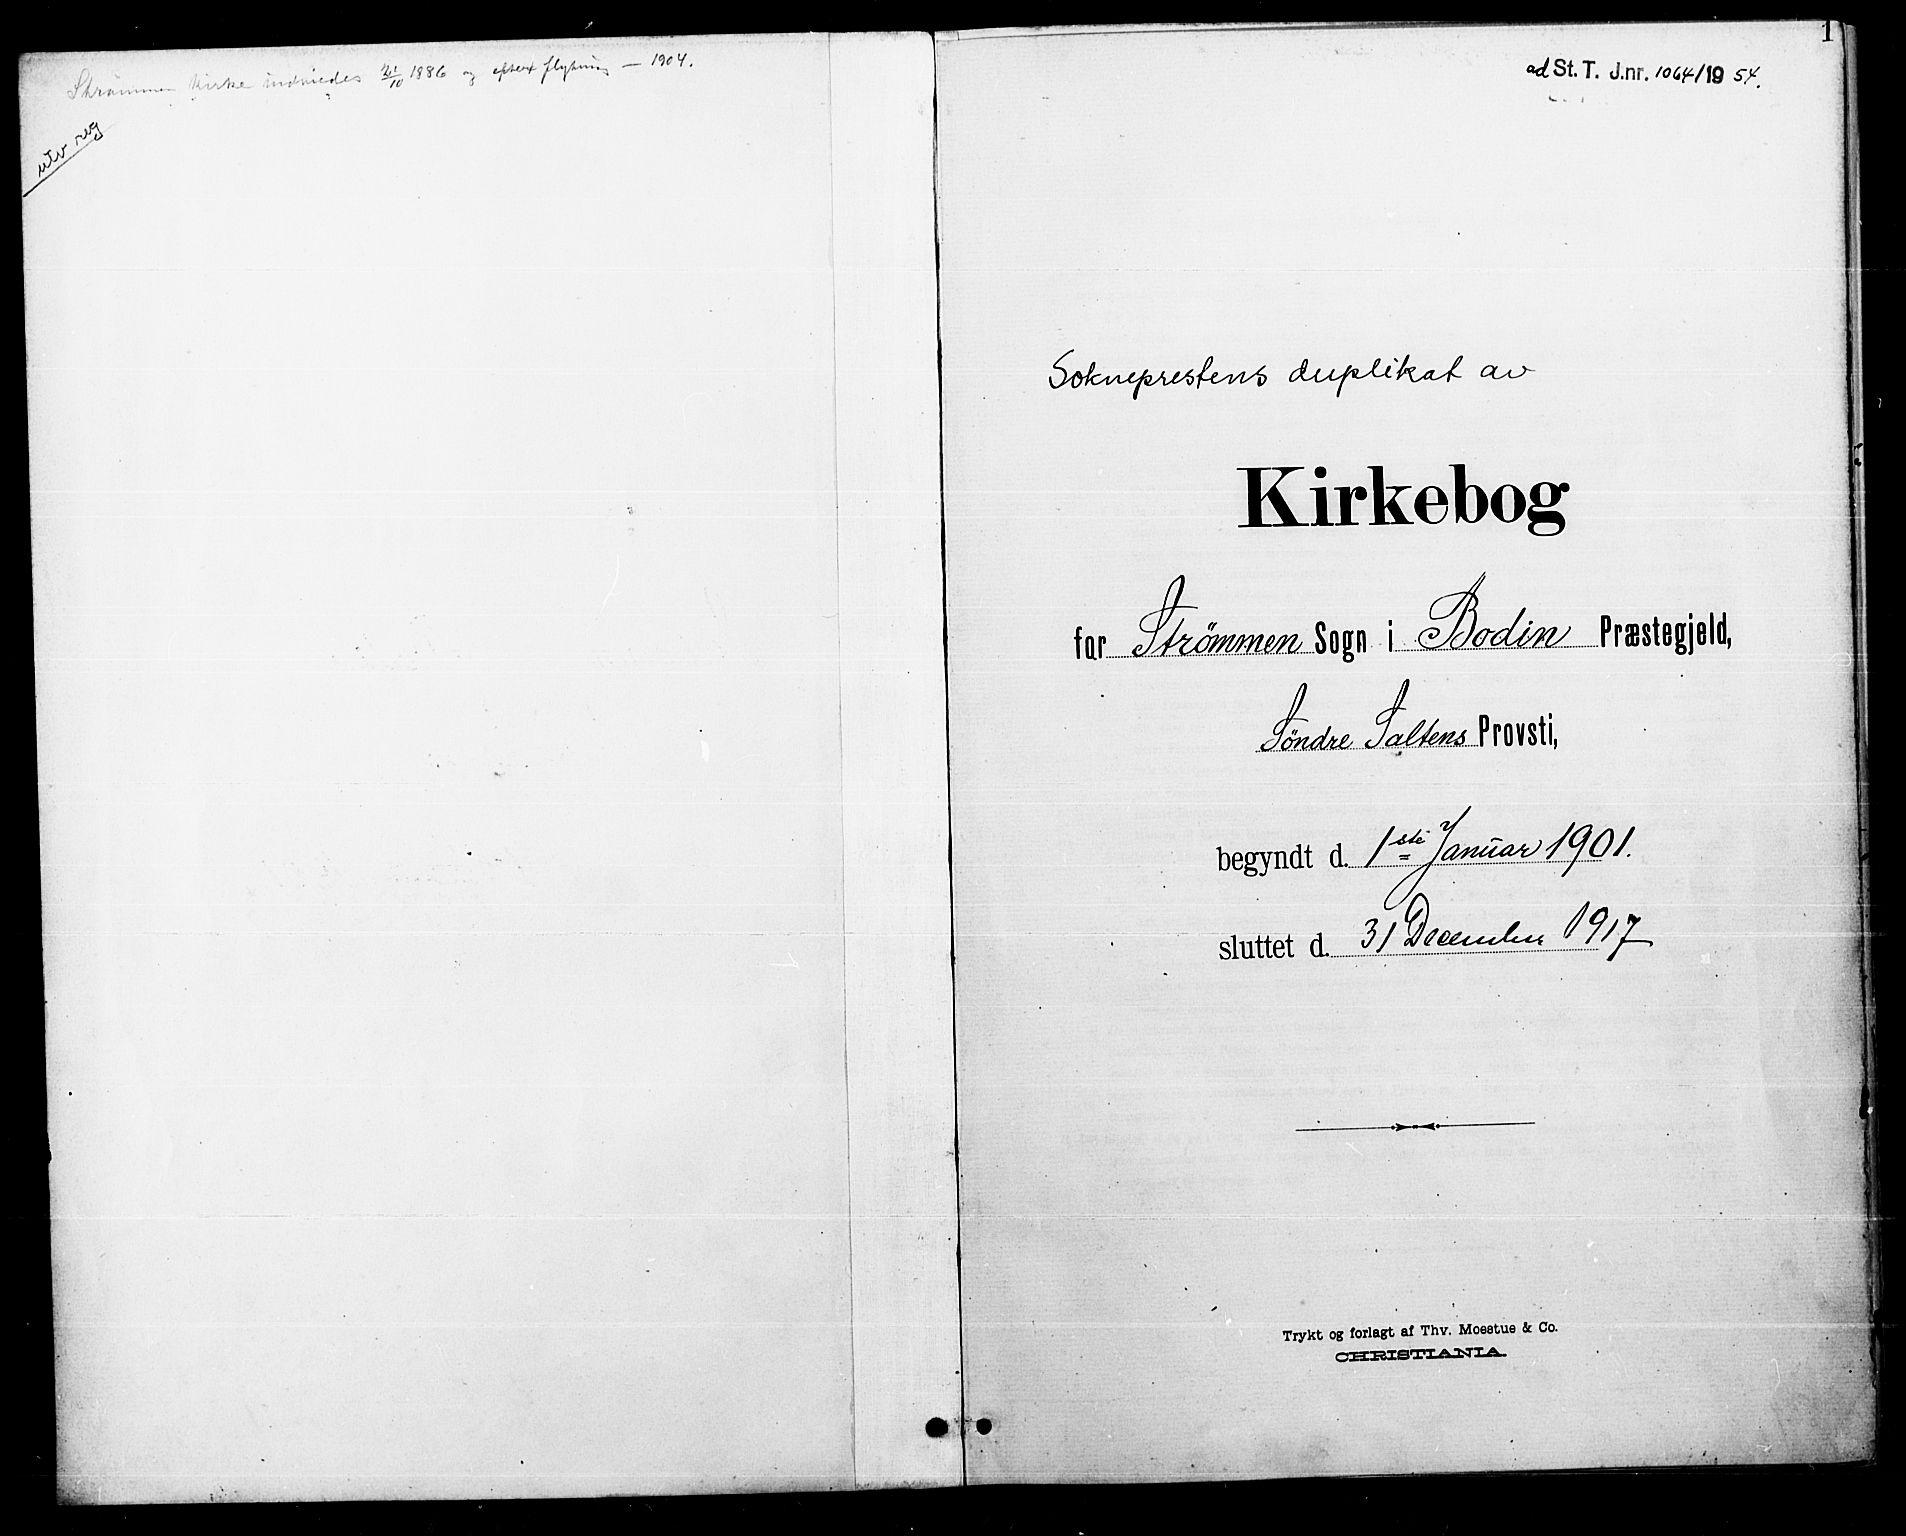 SAT, Ministerialprotokoller, klokkerbøker og fødselsregistre - Nordland, 804/L0088: Klokkerbok nr. 804C01, 1901-1917, s. 1